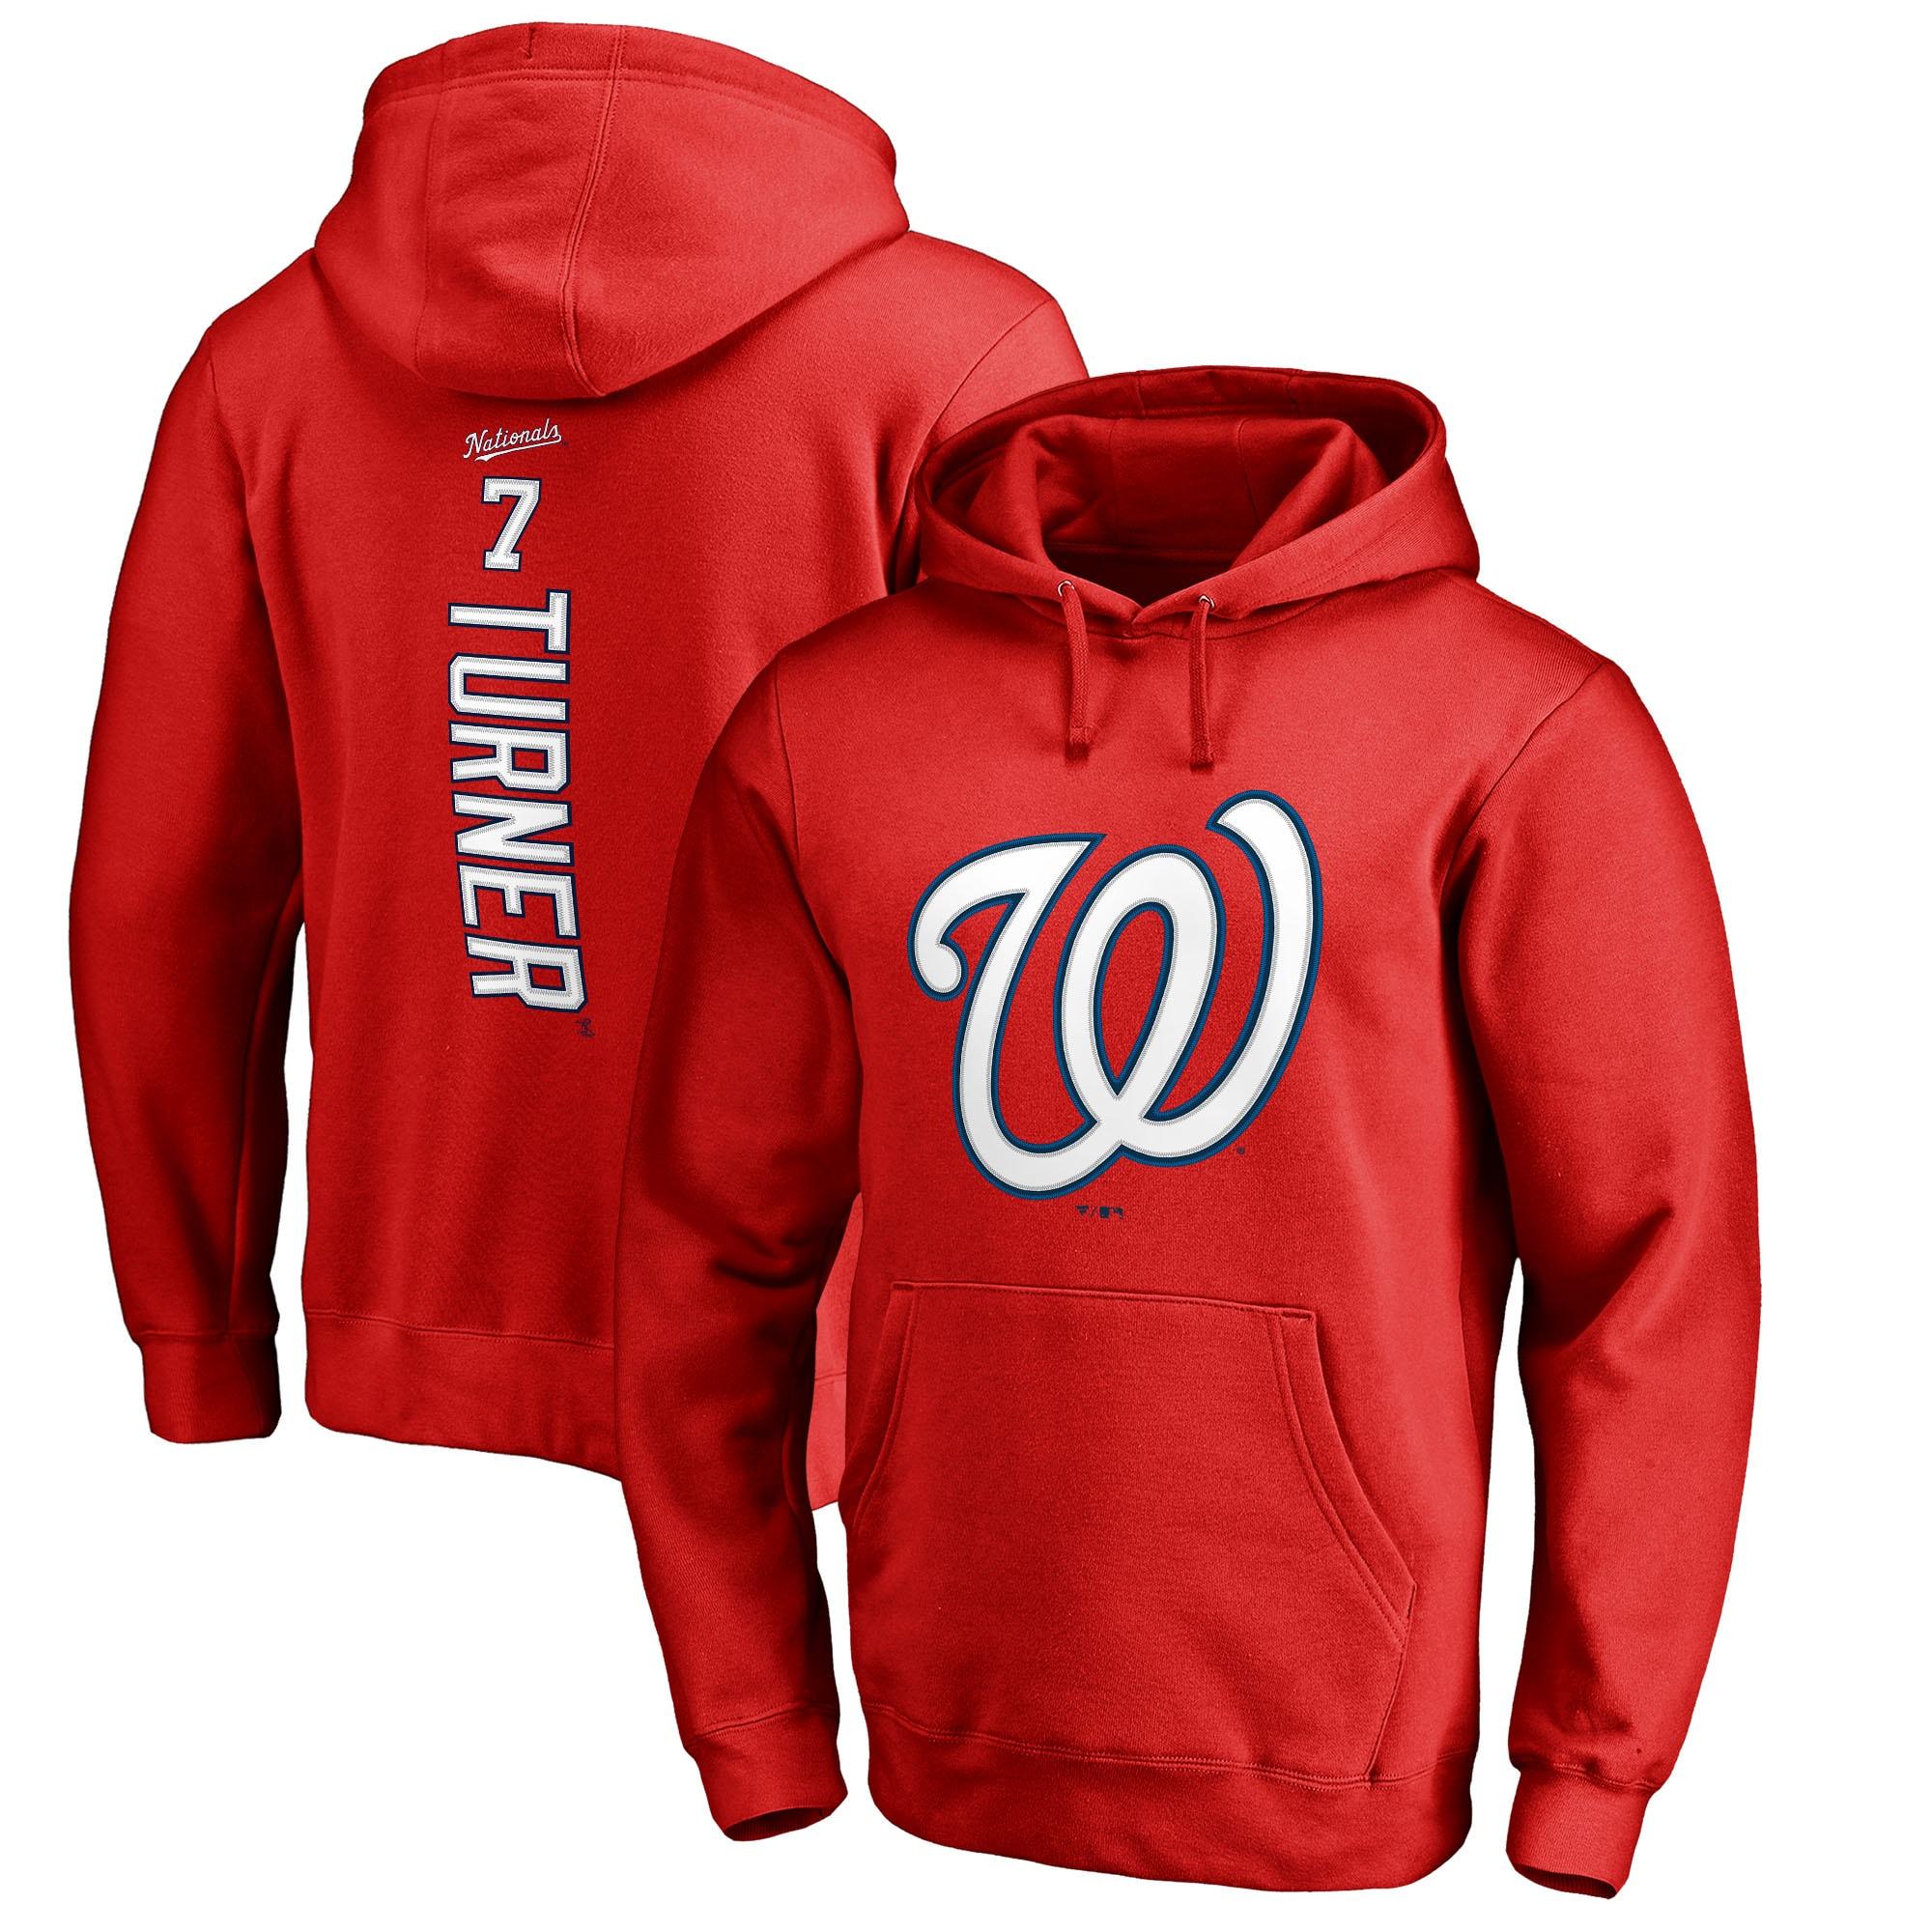 Trea Turner Washington Nationals Fanatics Branded Backer Pullover Hoodie - Red